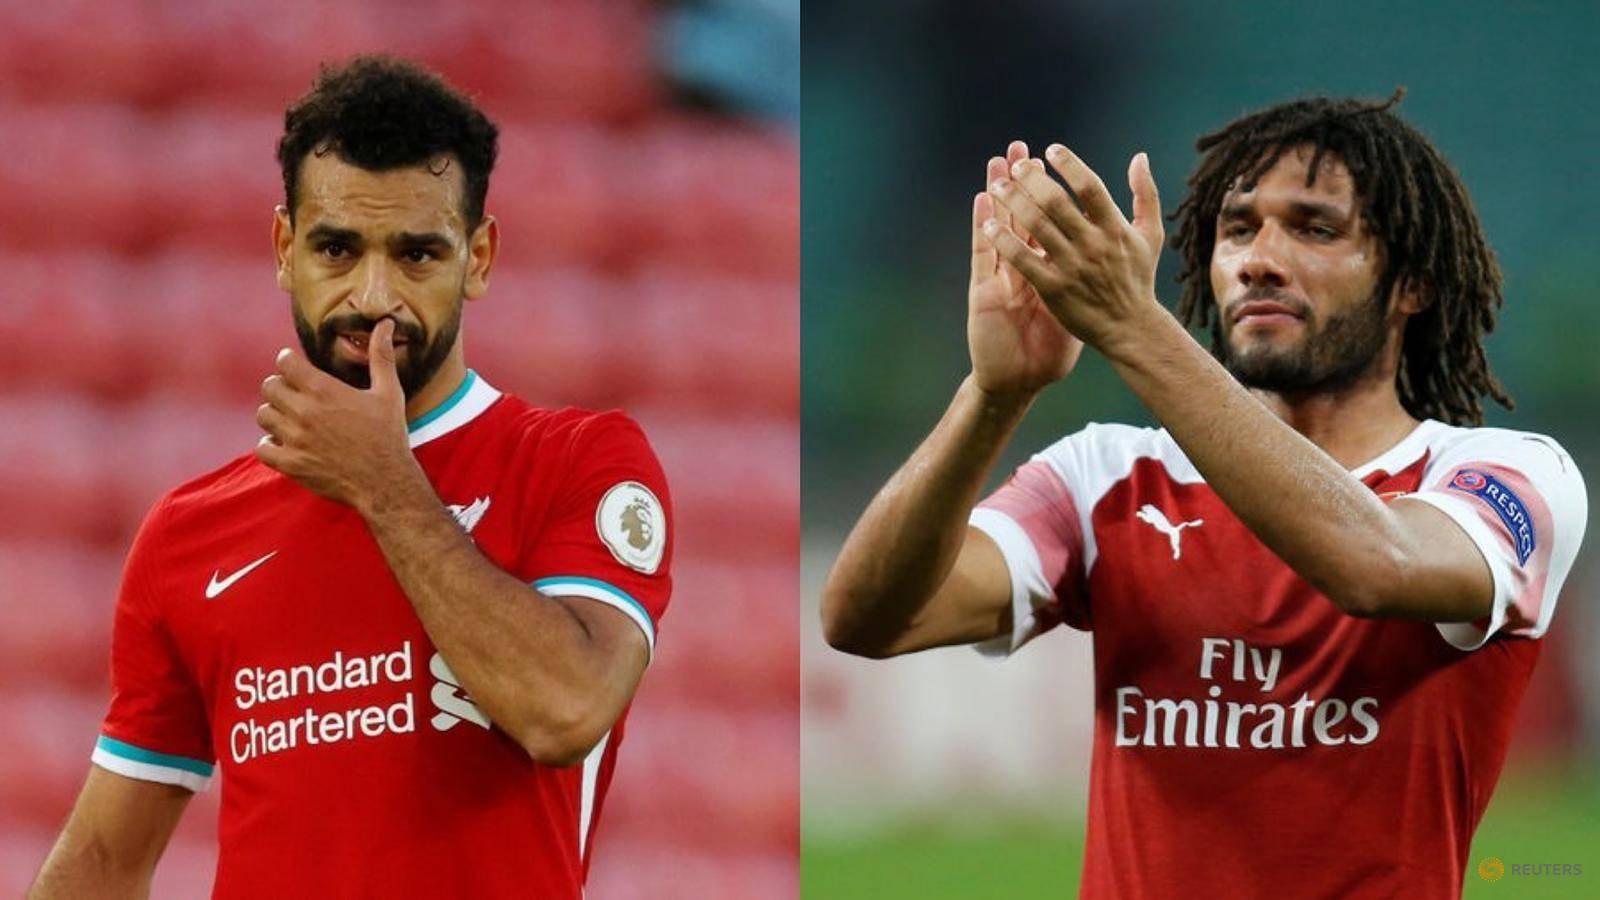 Salah, Arsenal's Elneny contract COVID-19 again